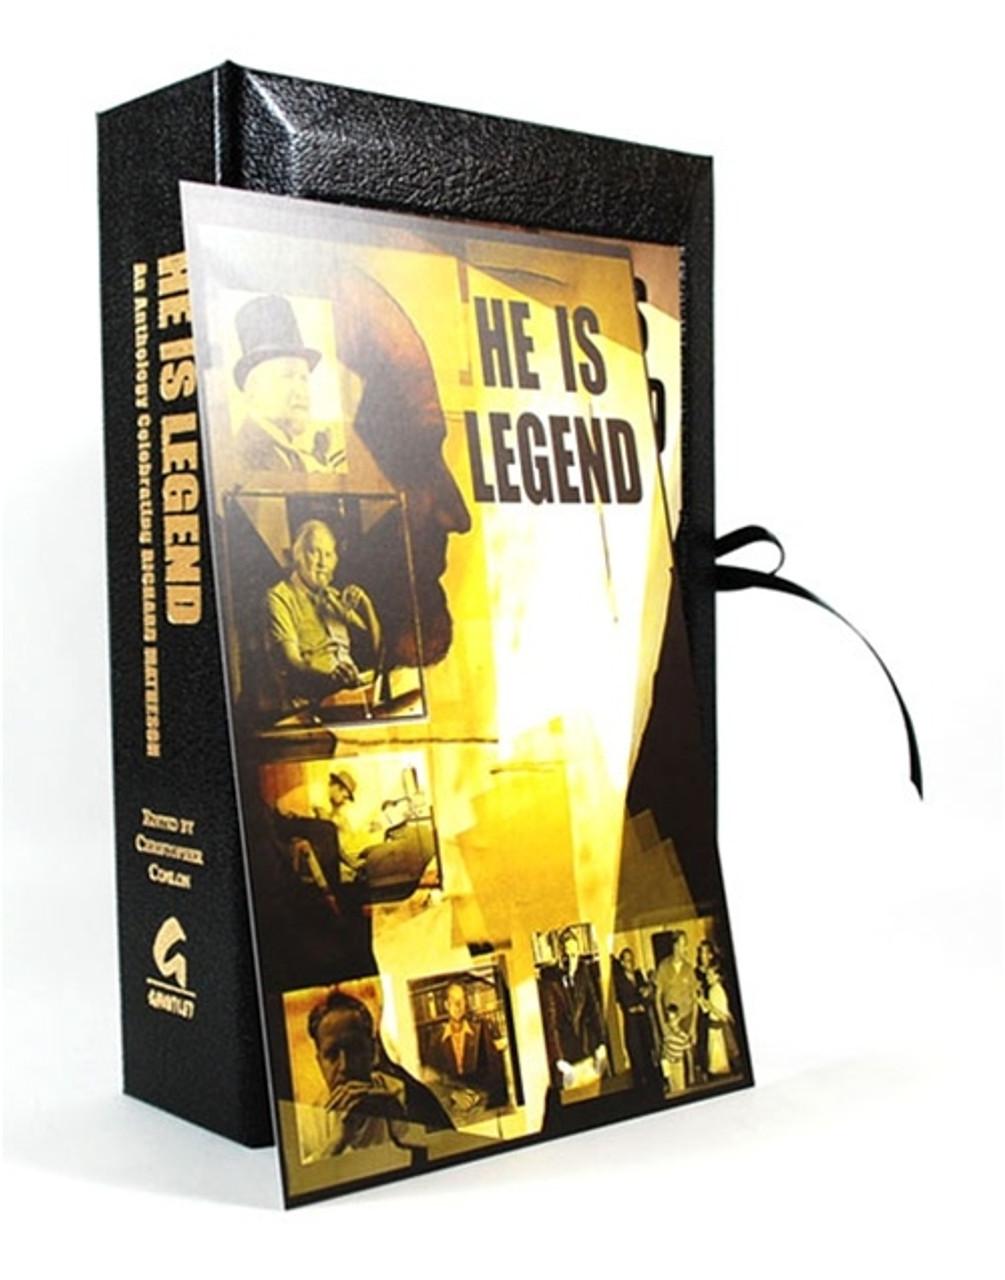 """He Is Legend"" Signed Limited Anthology, Stephen King, Joe Hill, and others Celebrating Richard Matheson"